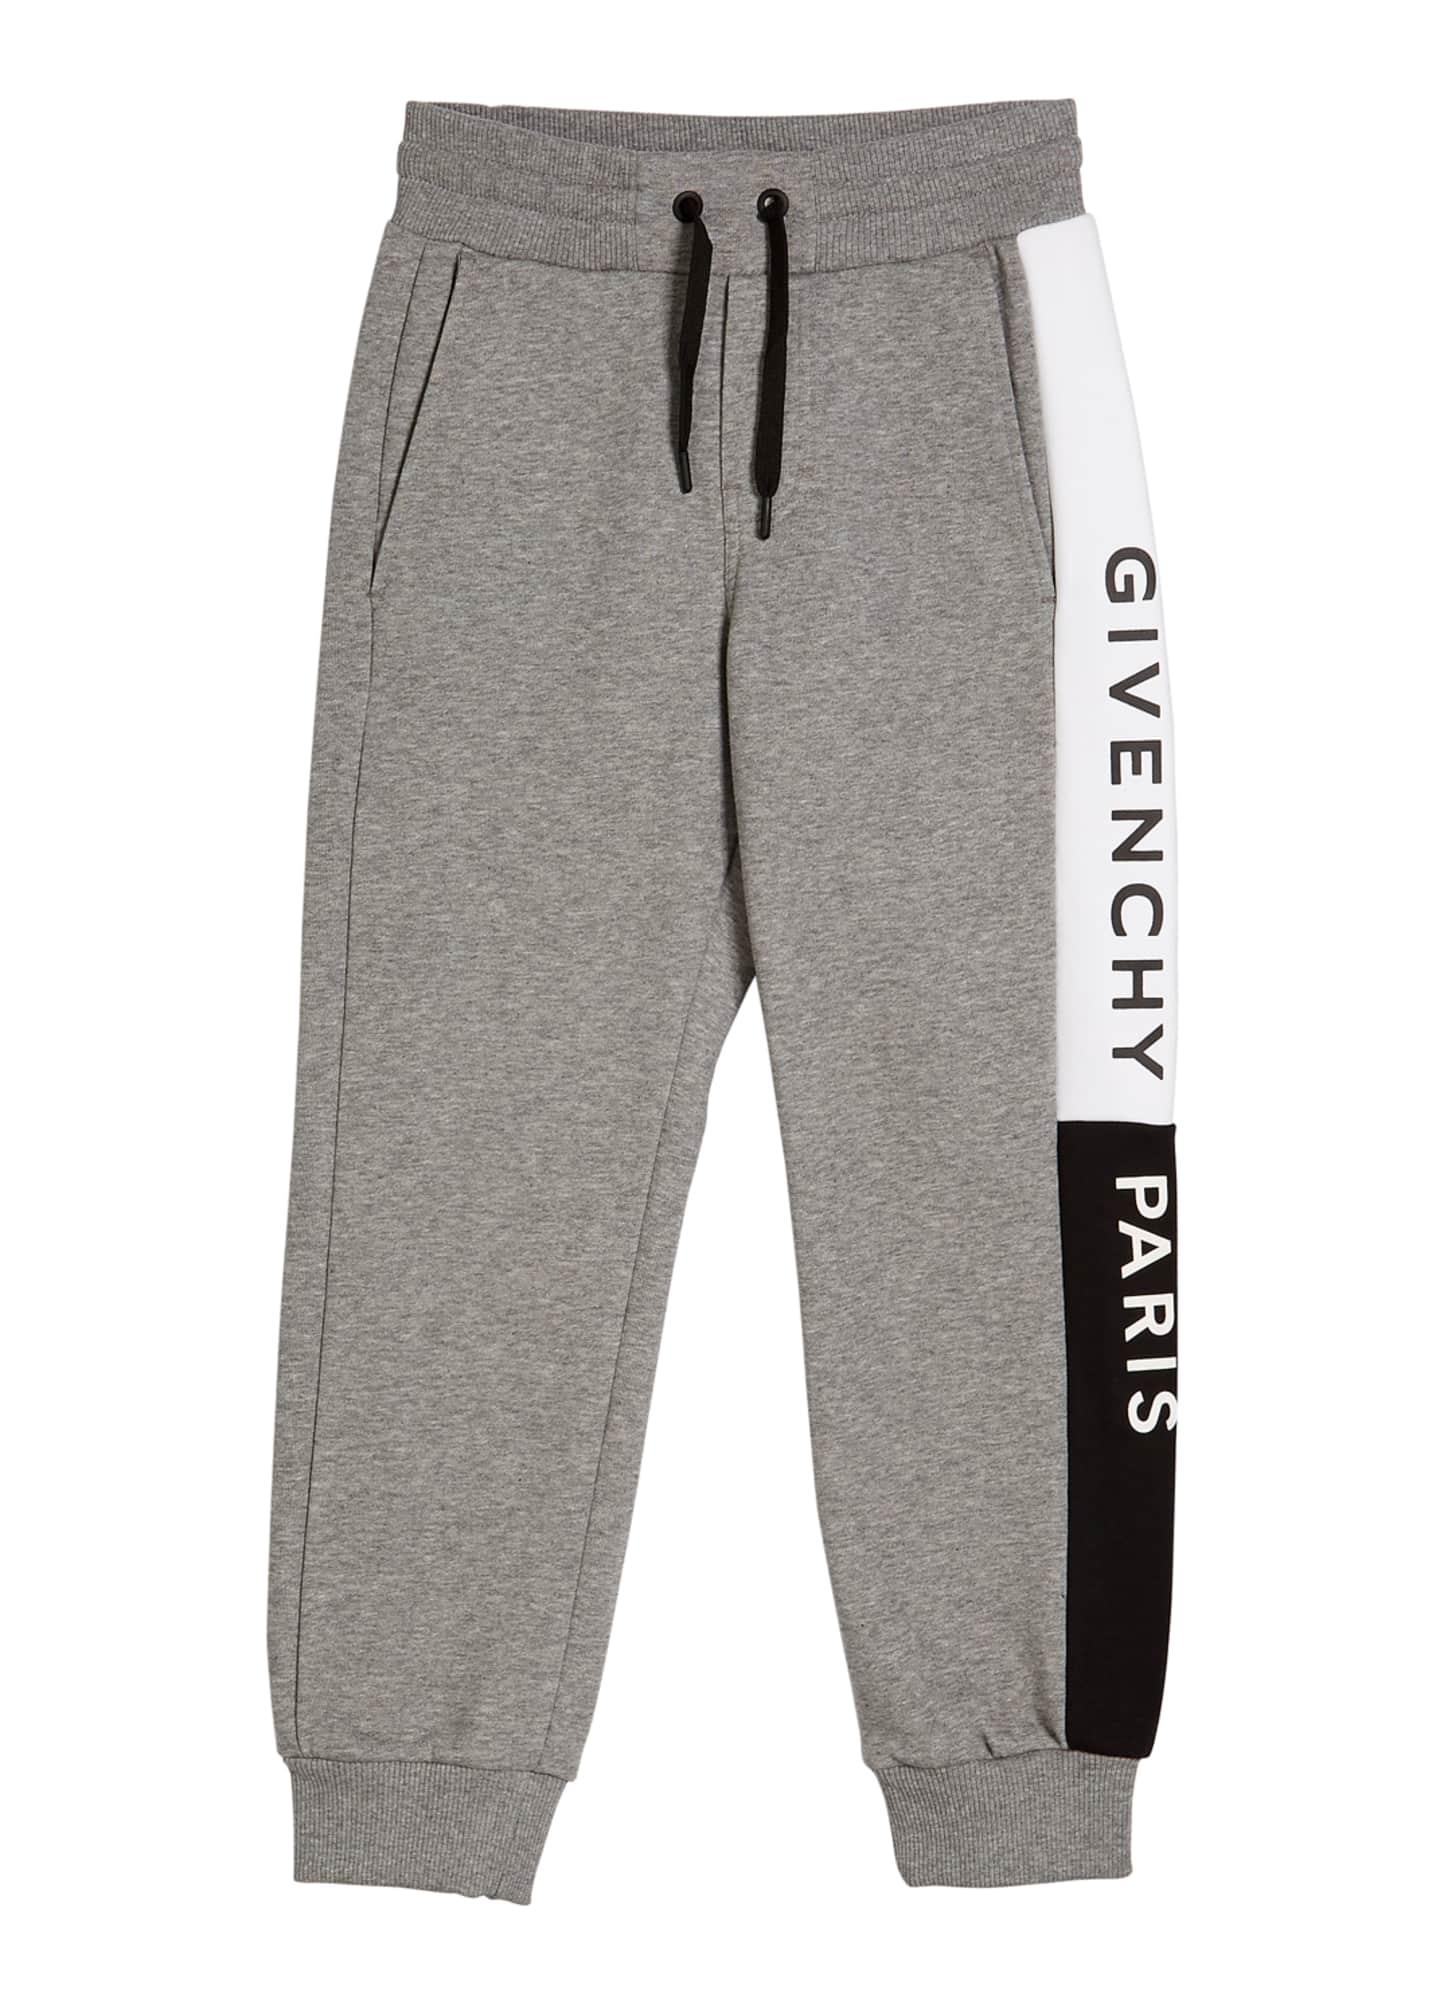 Givenchy Boy's Heathered Logo Trim Joggers, Size 4-10